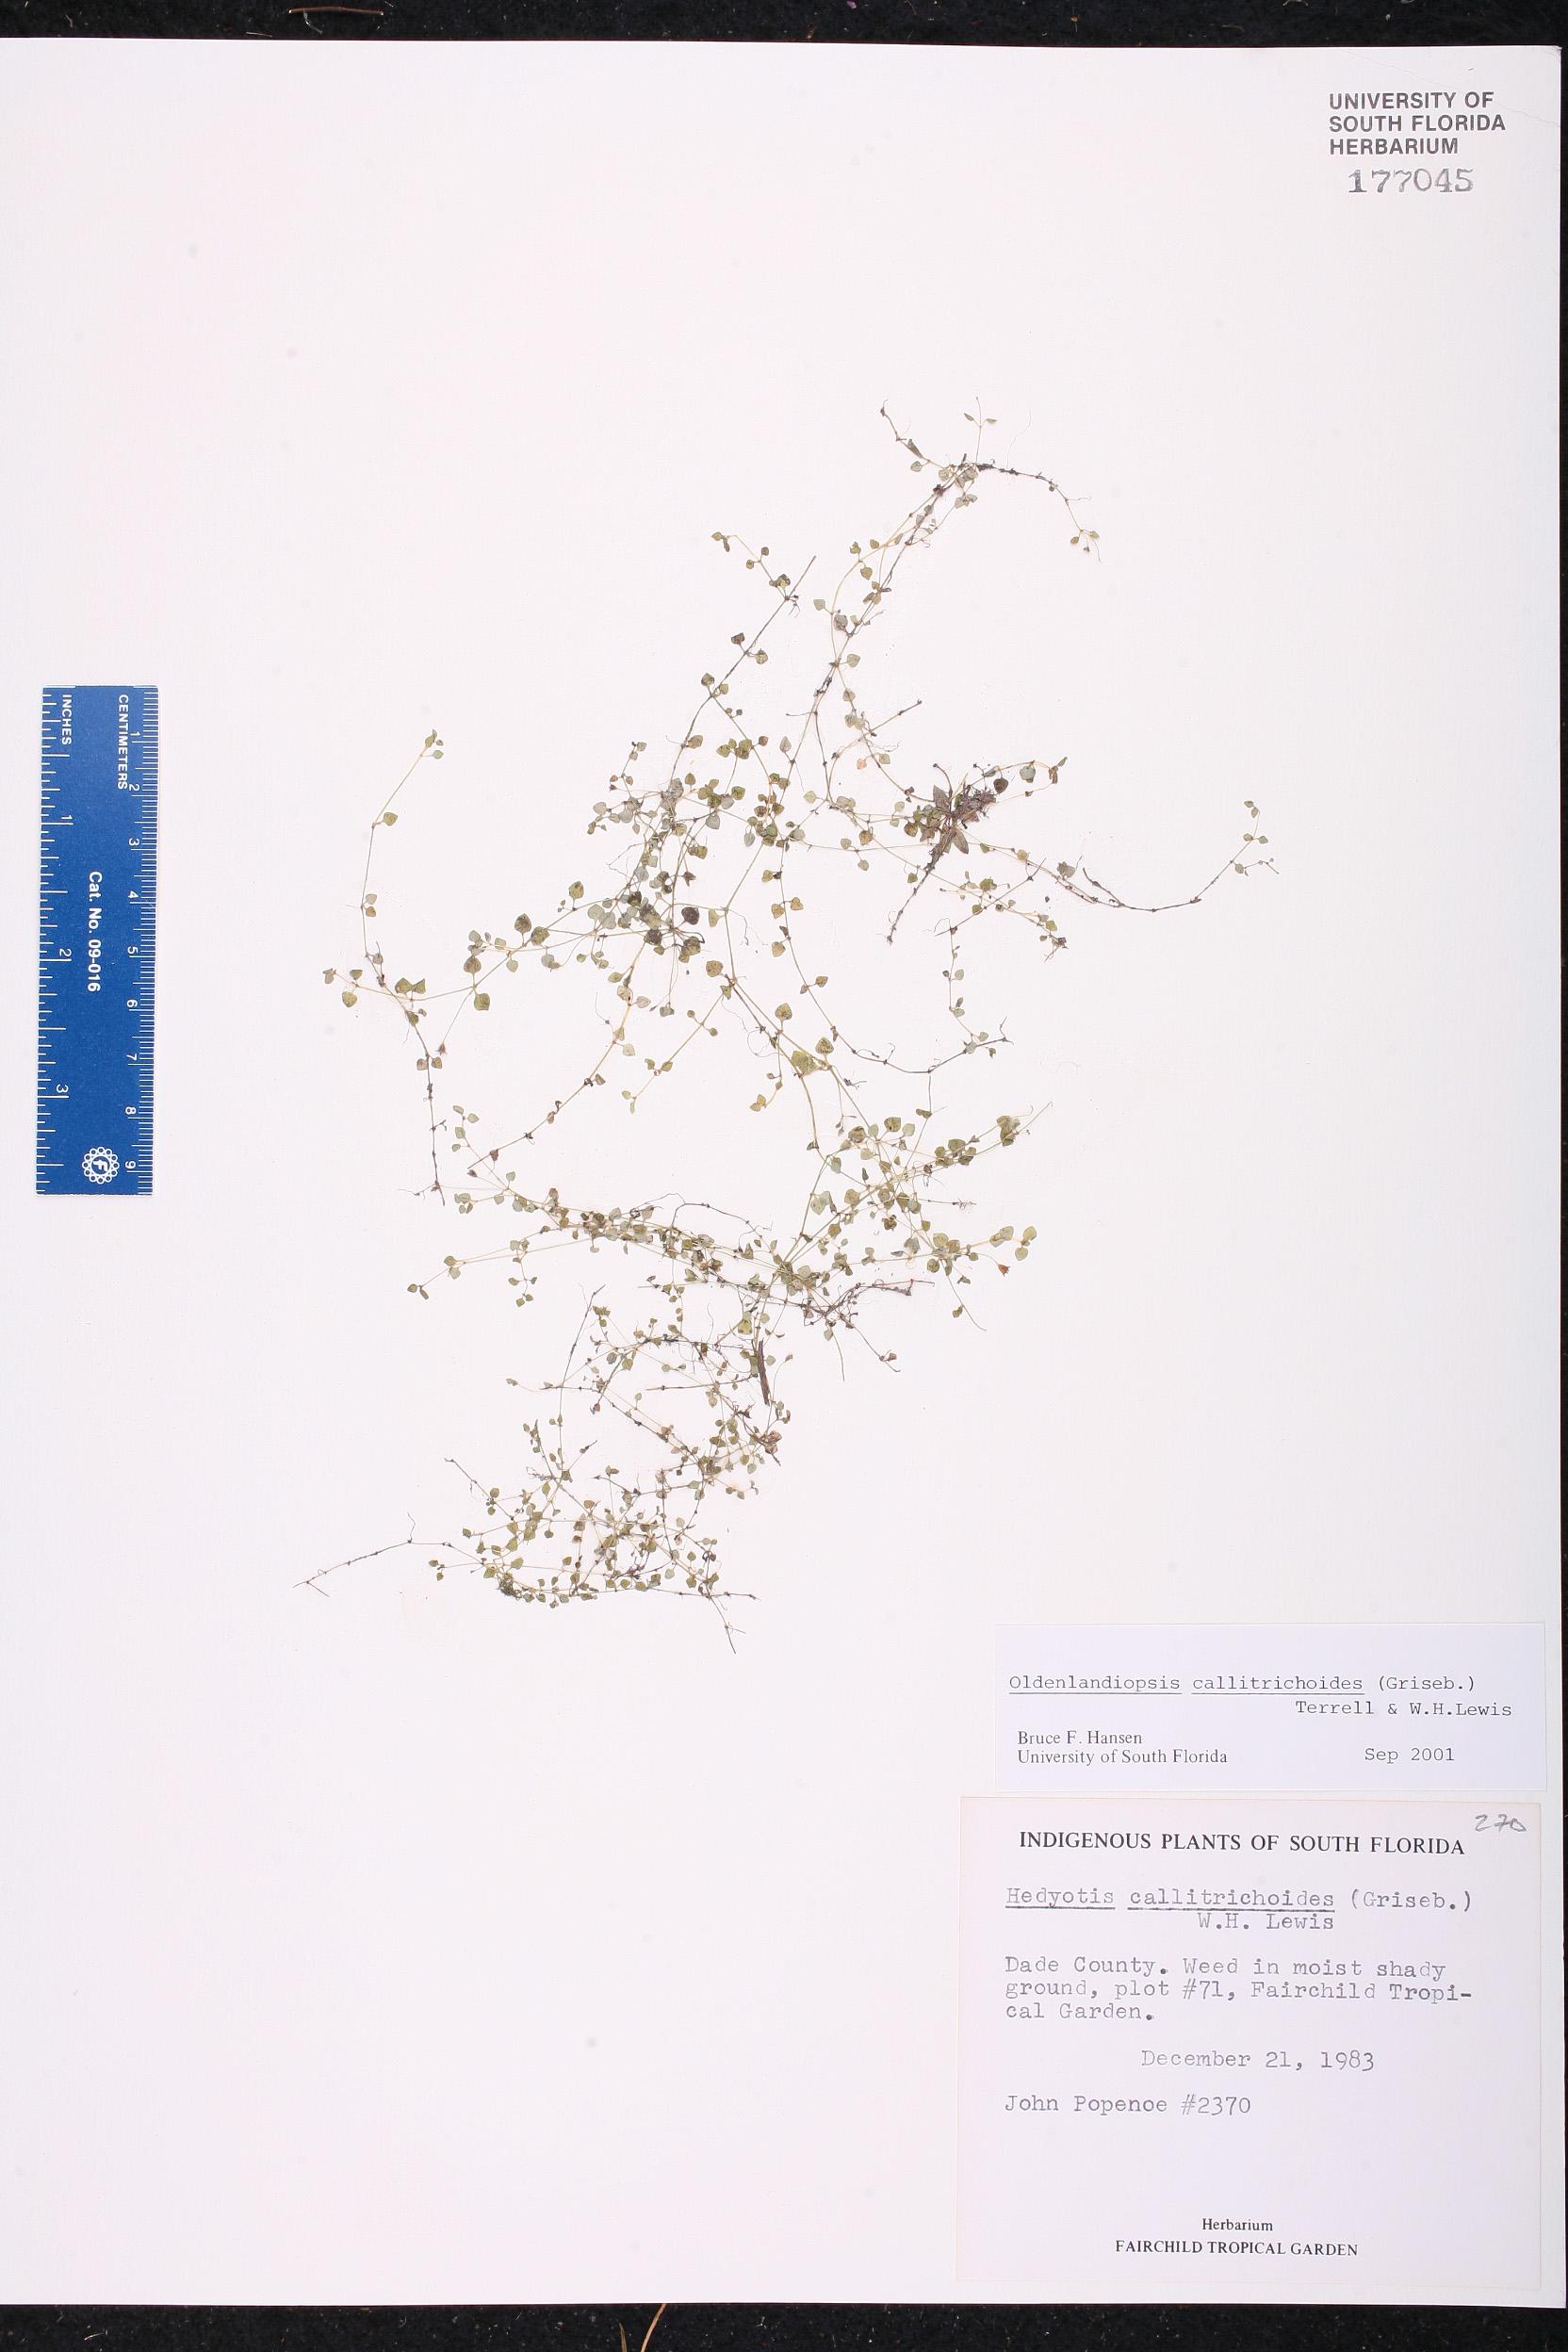 Oldenlandiopsis callitrichoides image